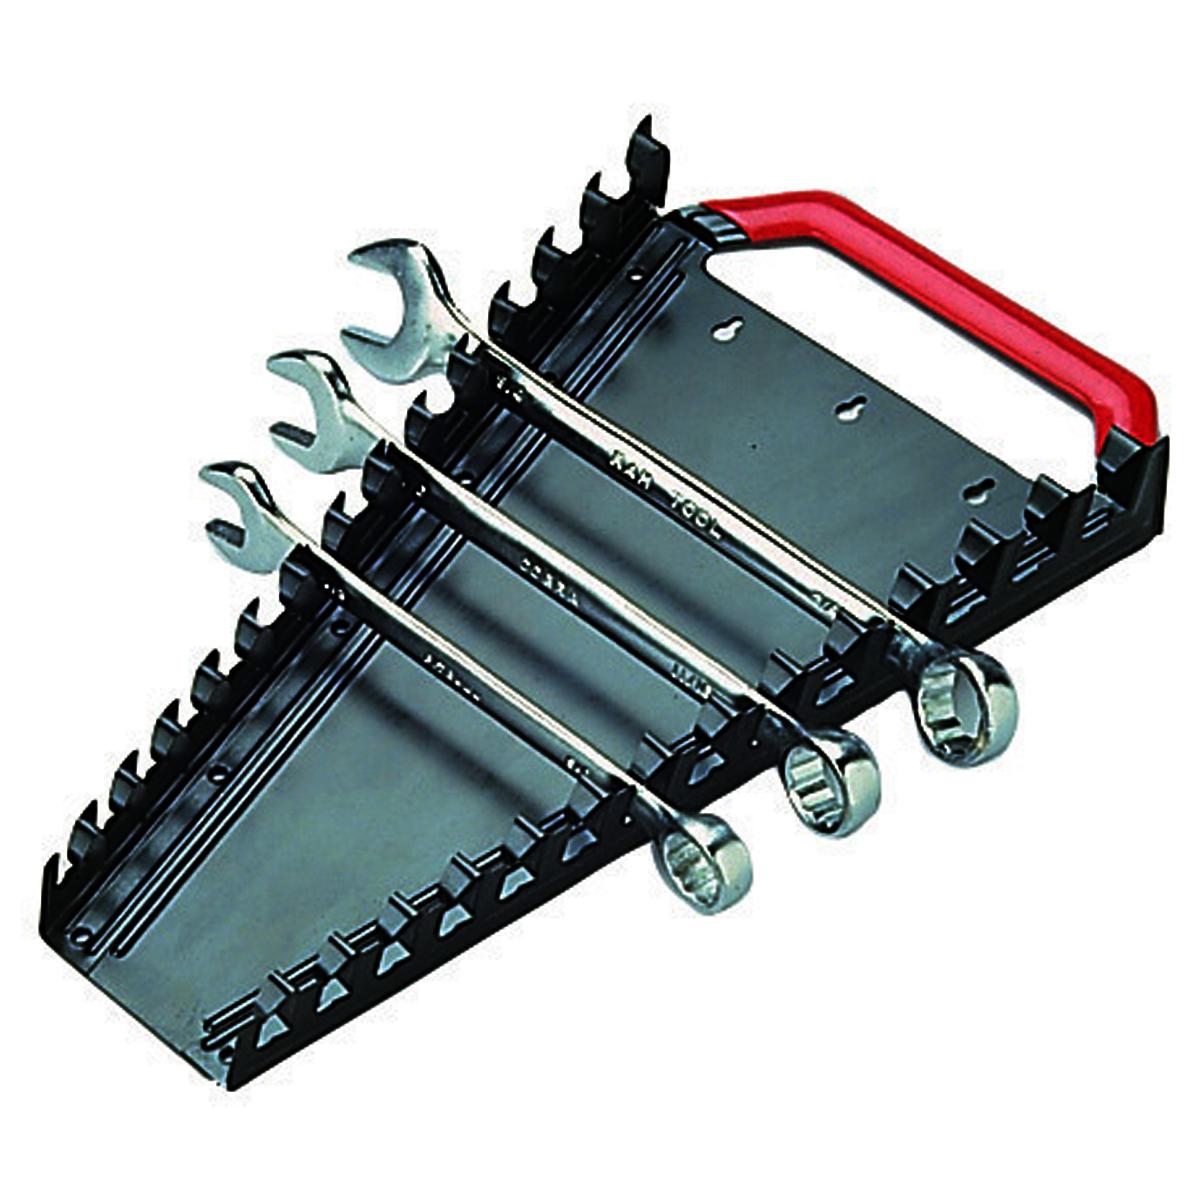 PITTSBURGH 14 Slot Wrench Rack - Item 04800